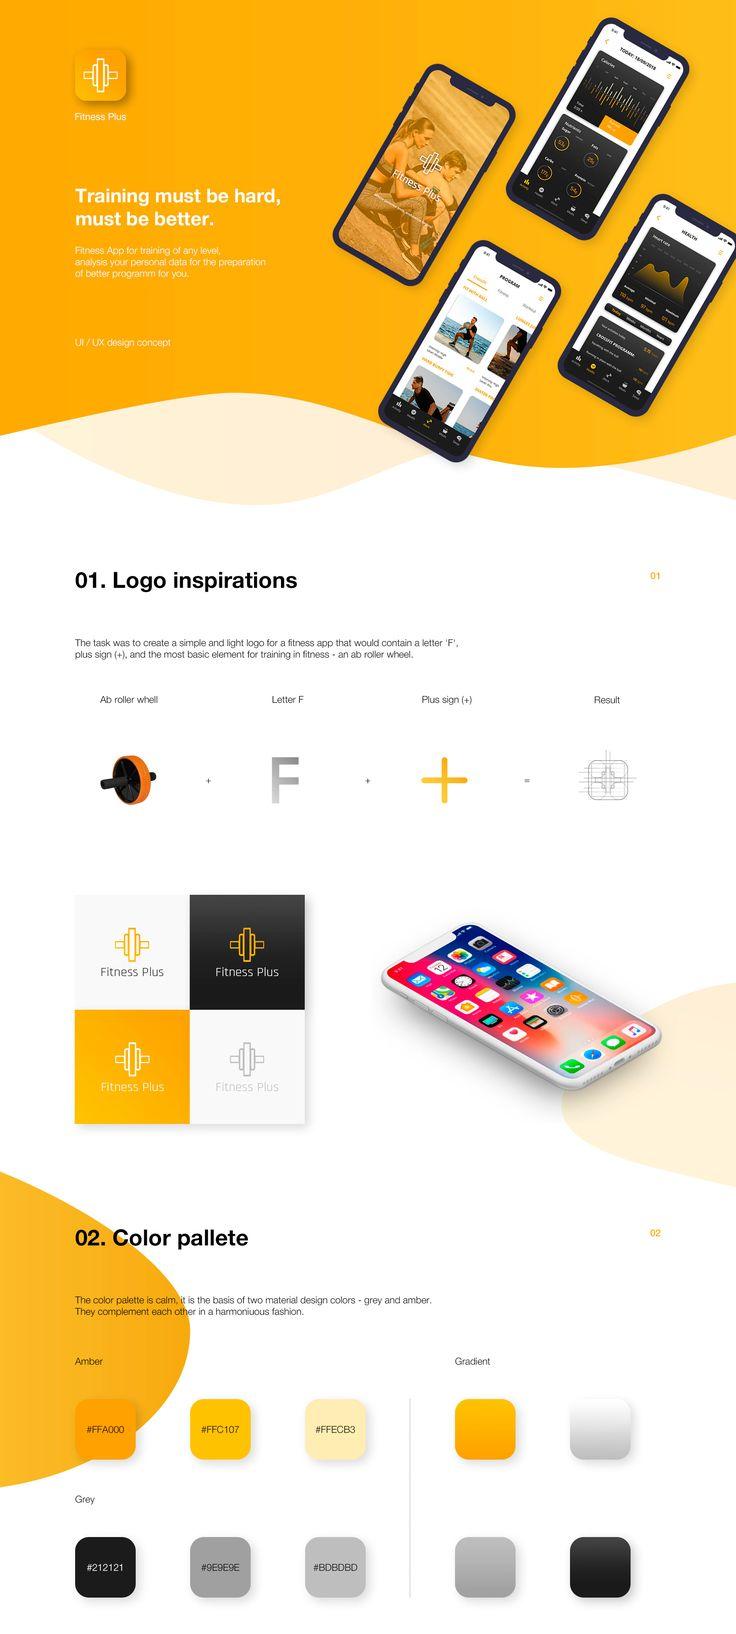 Fitness Plus – Mobile App (UX/UI design concept) on Behance